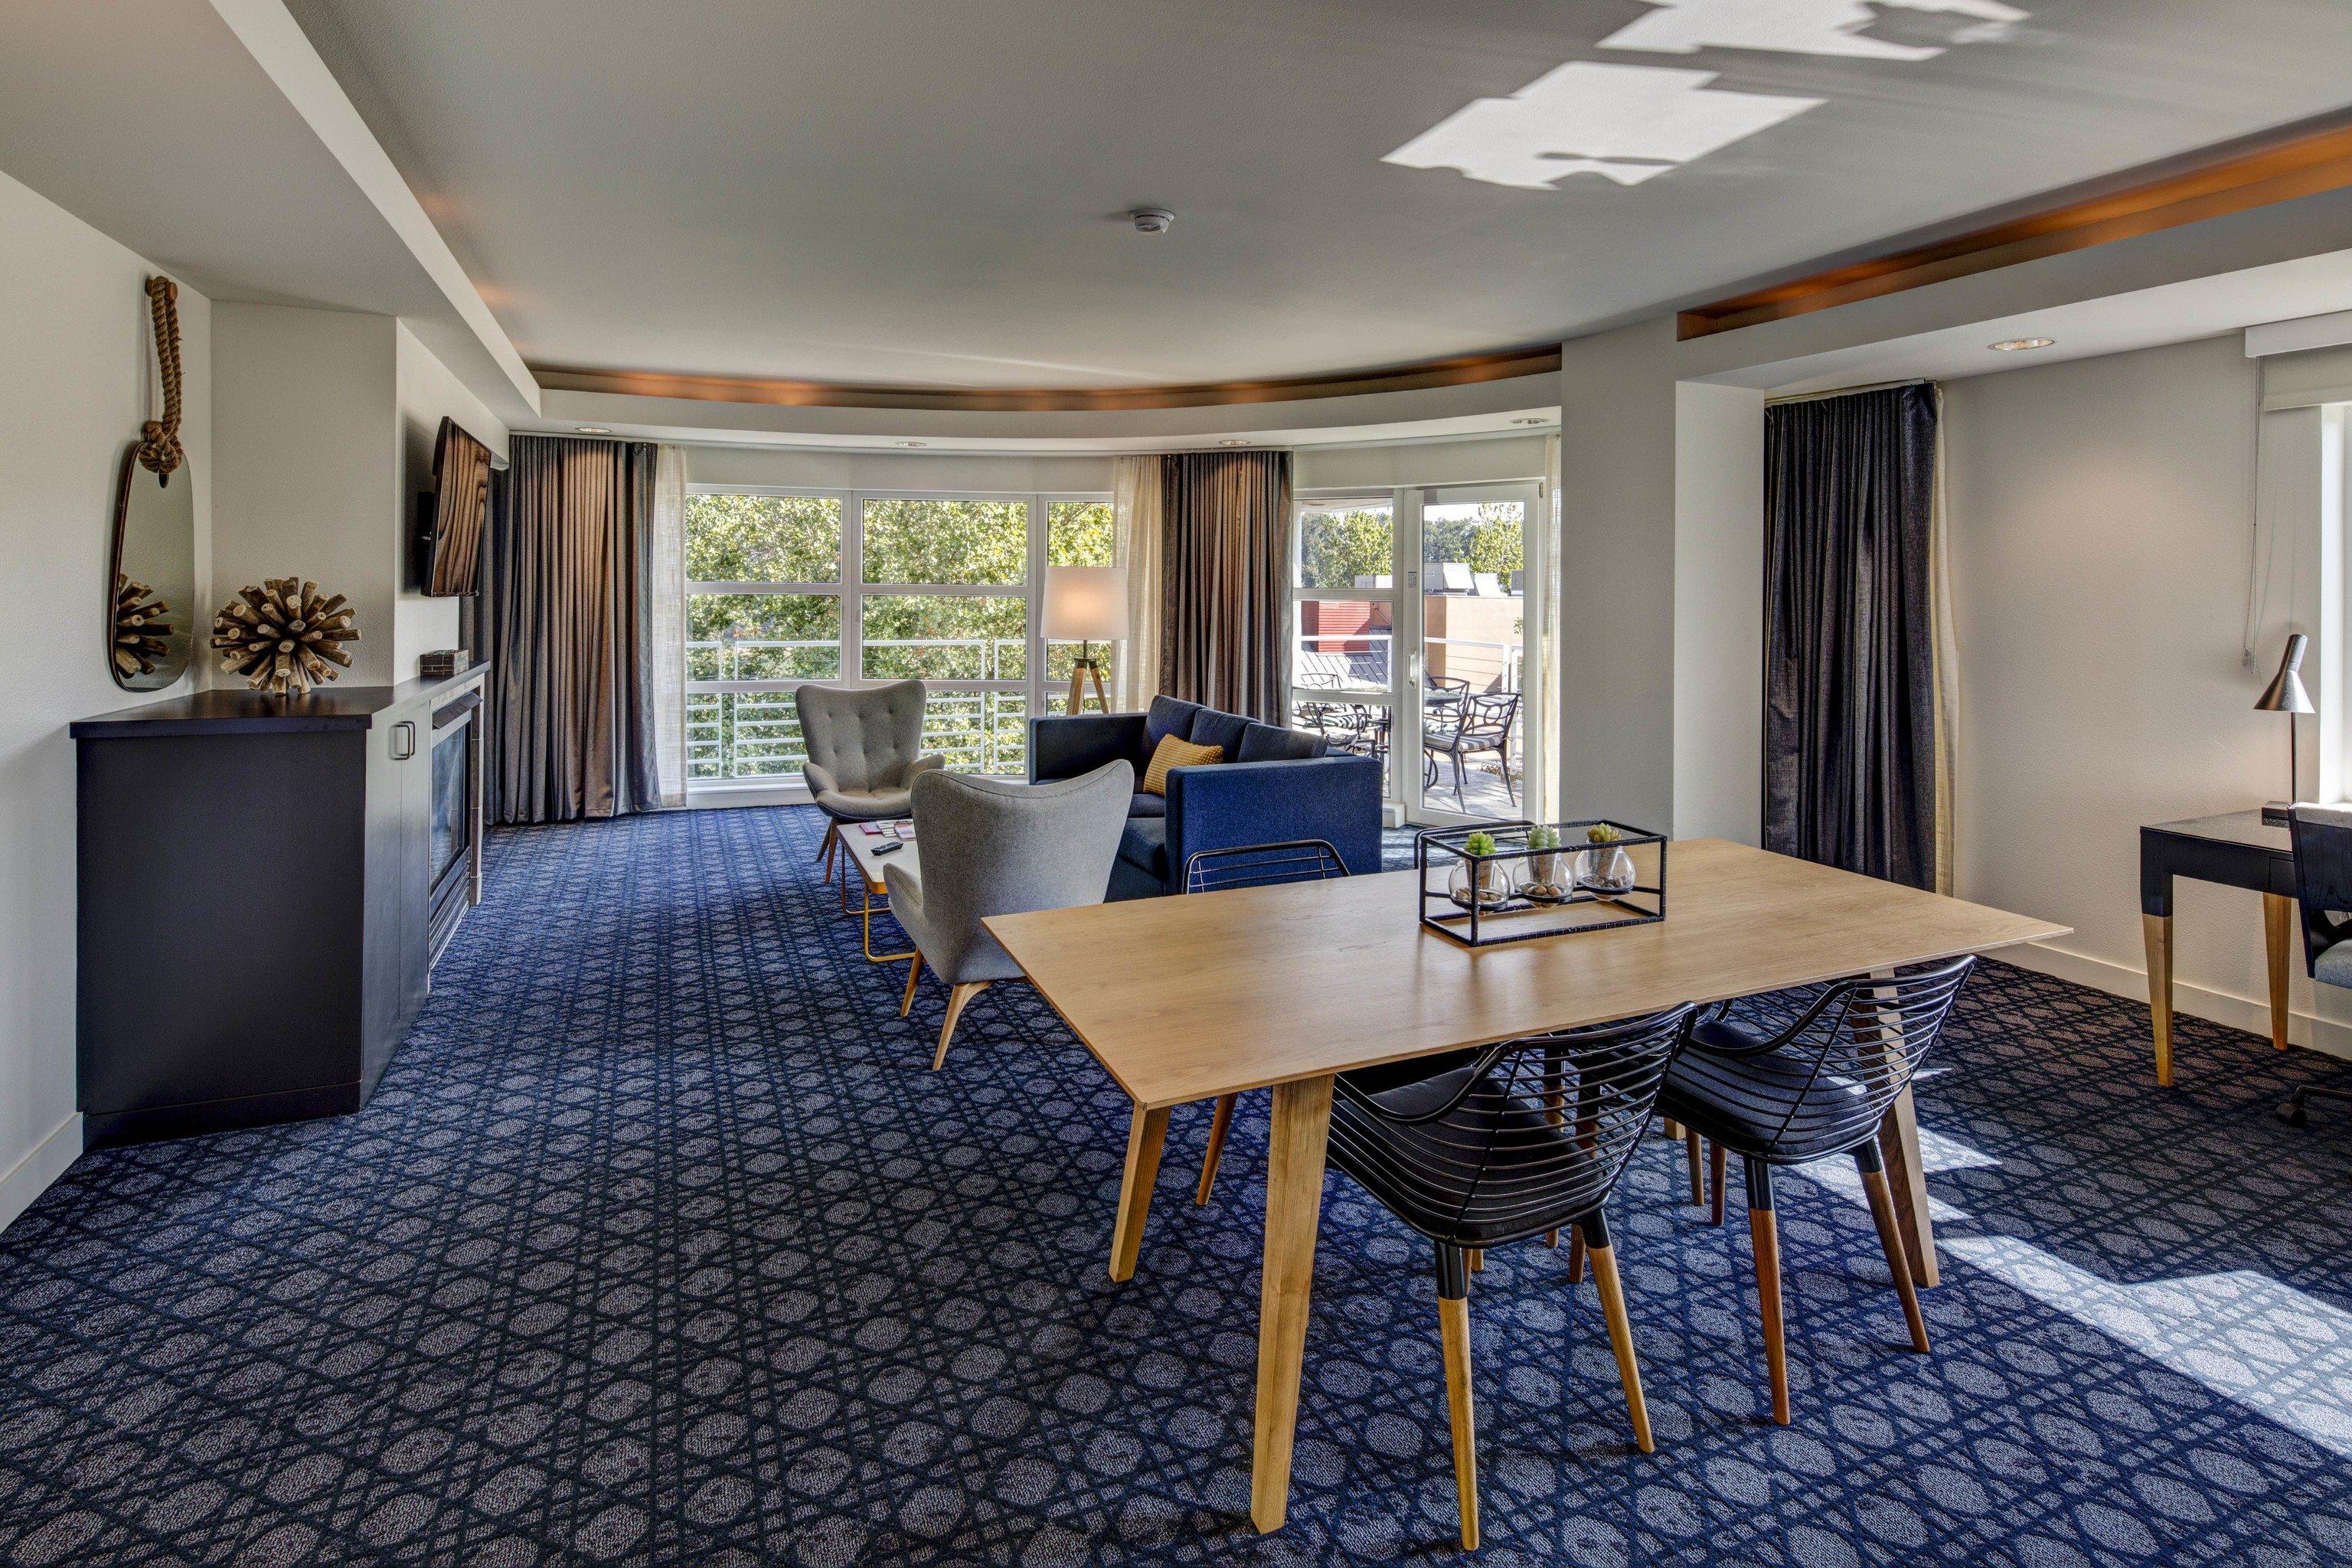 property flooring house Suite chair Bedroom